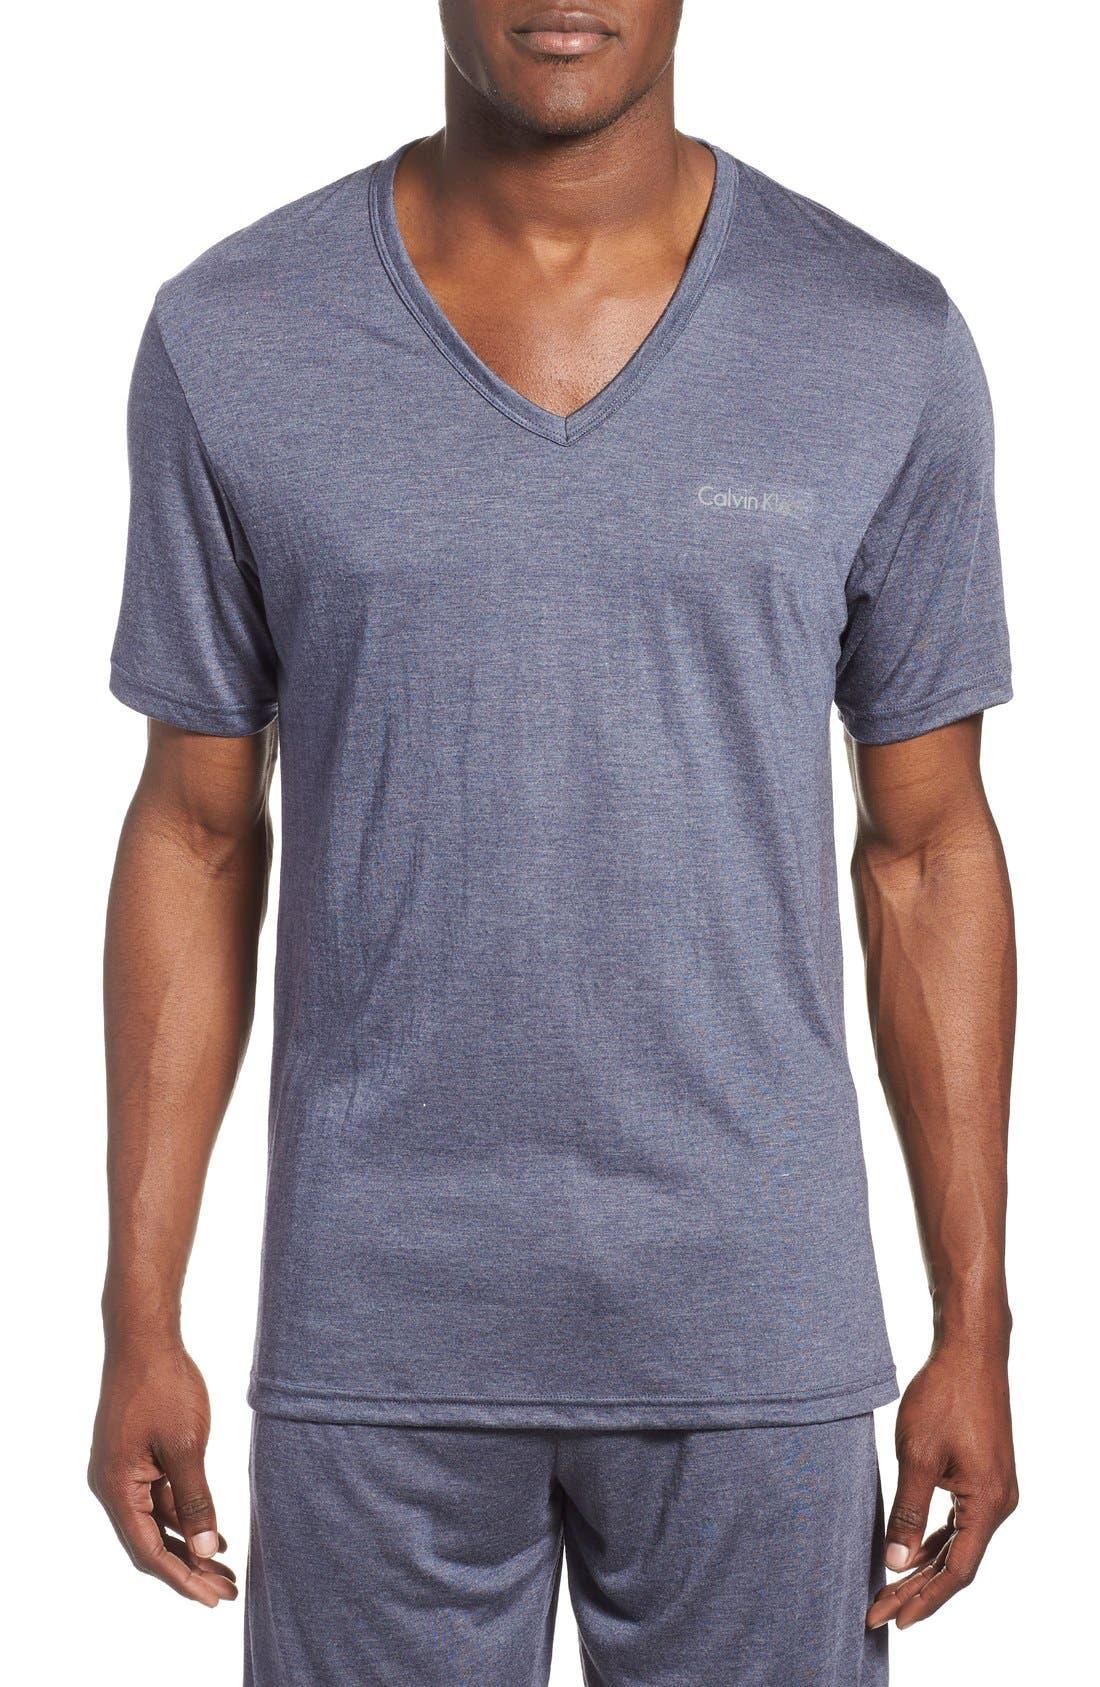 Alternate Image 1 Selected - Calvin Klein 'Liquid Lounge' V-Neck T-Shirt